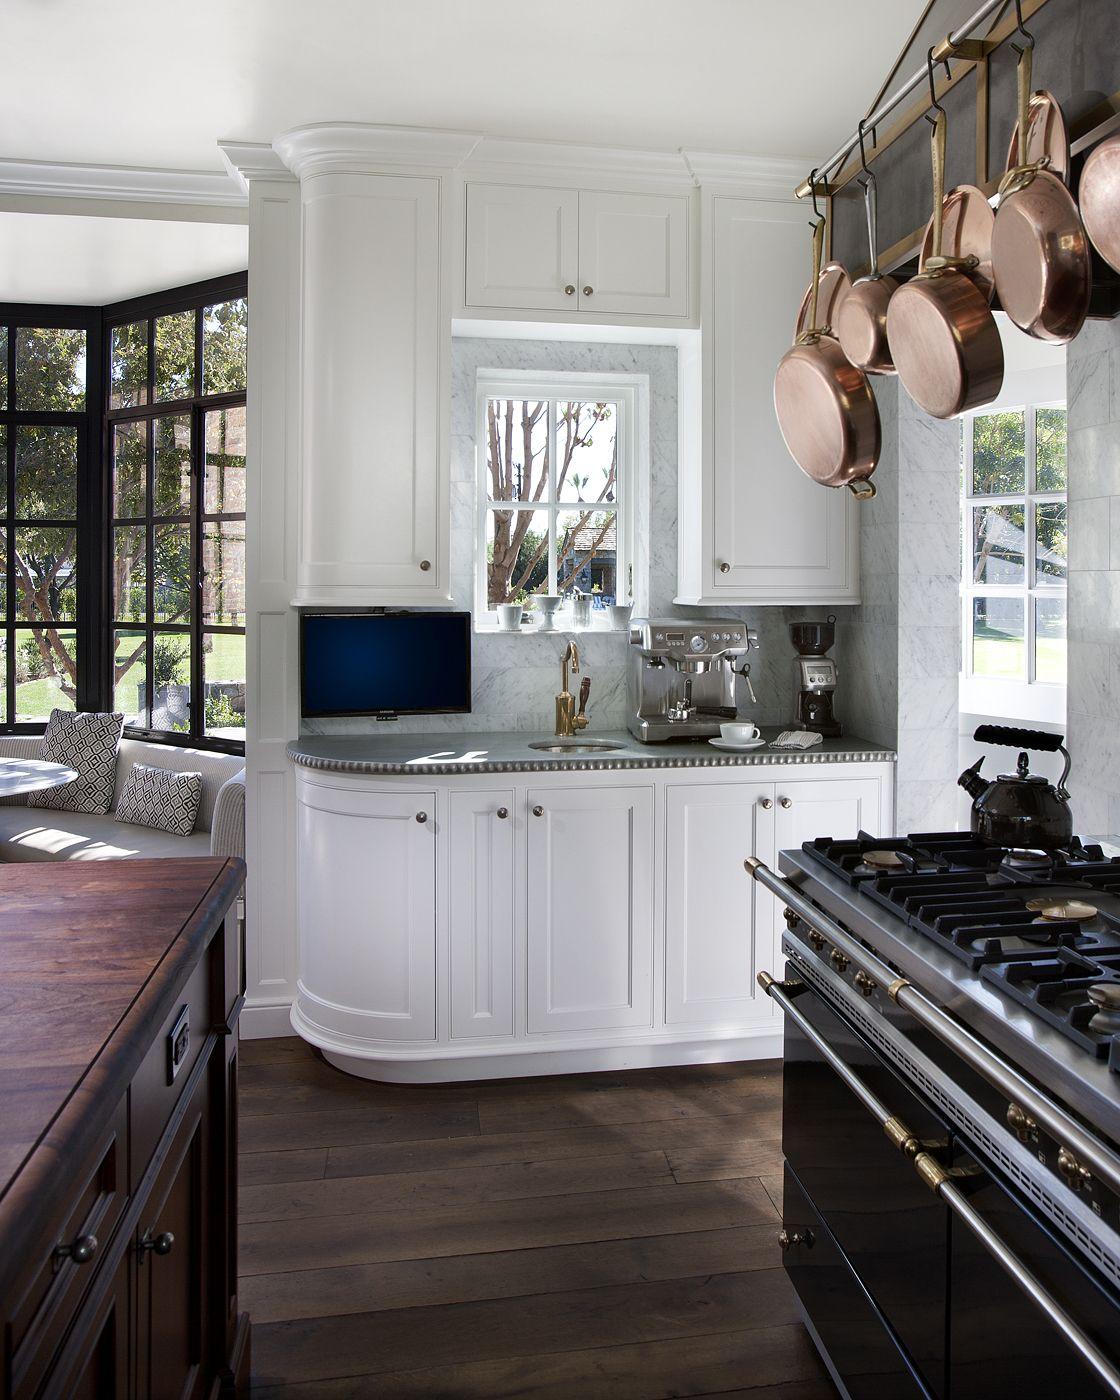 Pin by Karen Hughes on kitchen ideas   Pinterest   Traditional ...